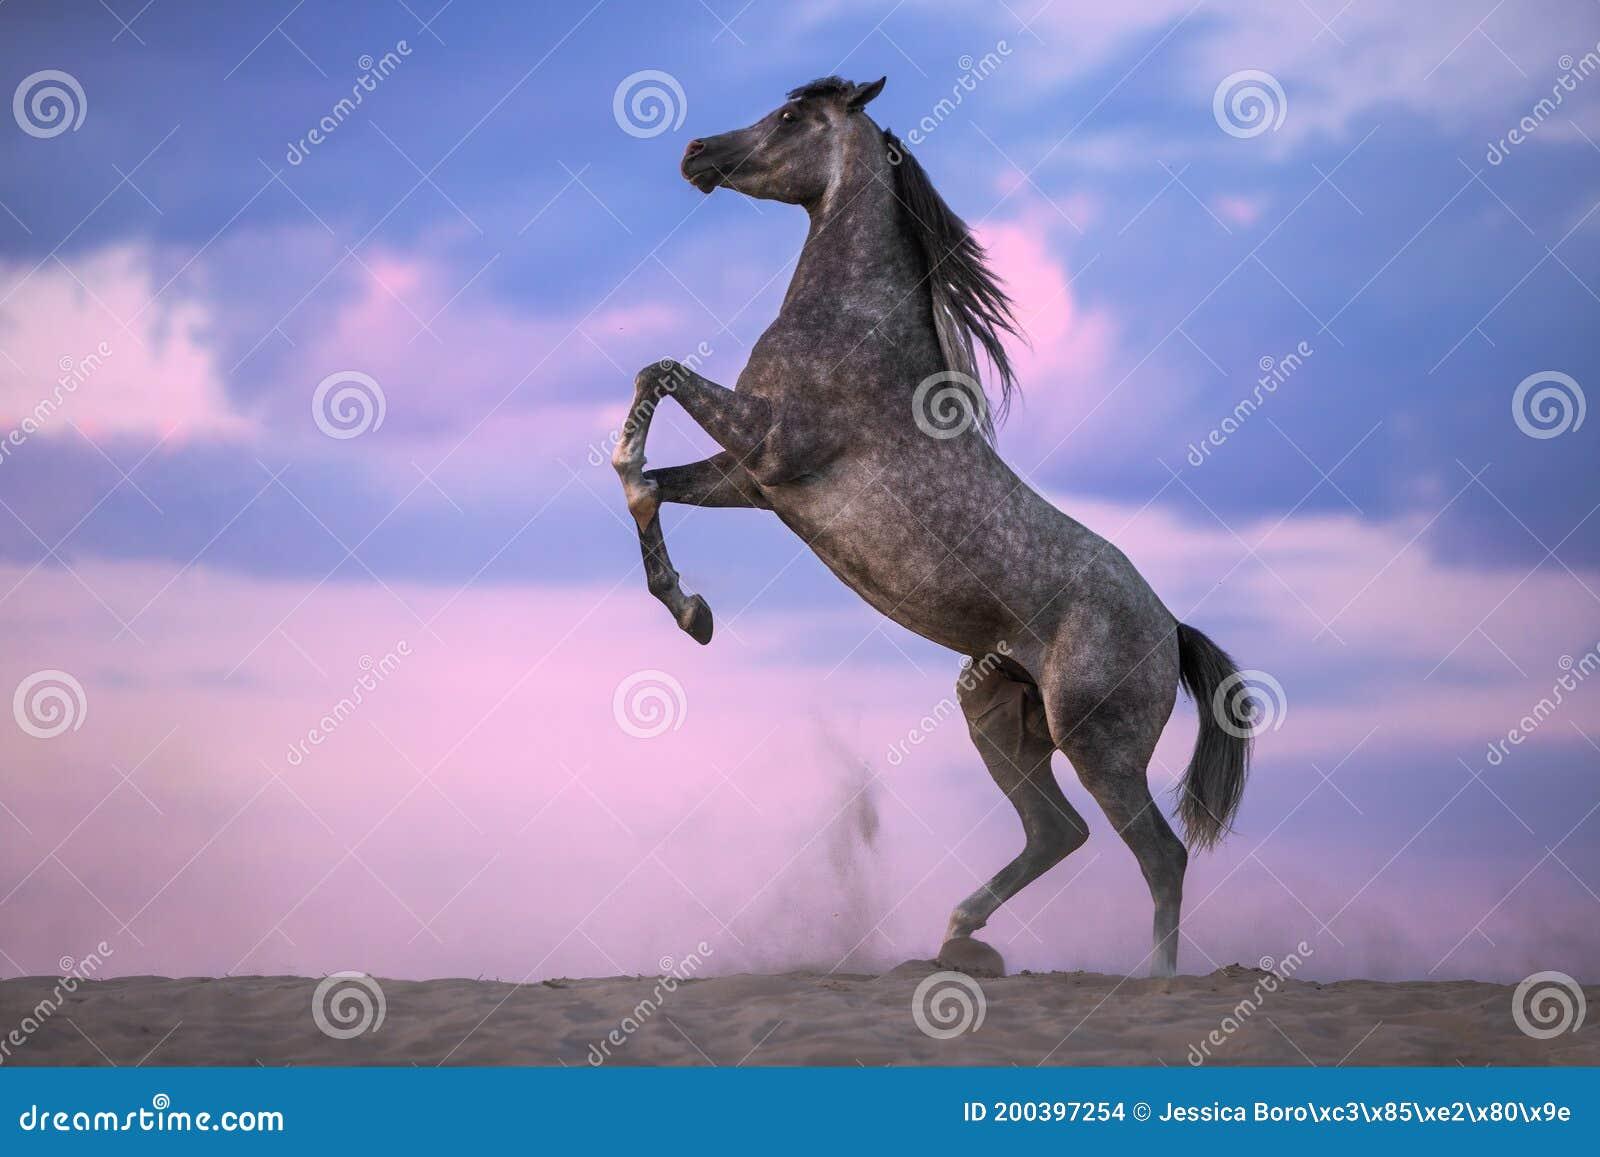 Grey Arabian Horse Rearing On Cloudy Background Stock Photo Image Of Desert Arabian 200397254